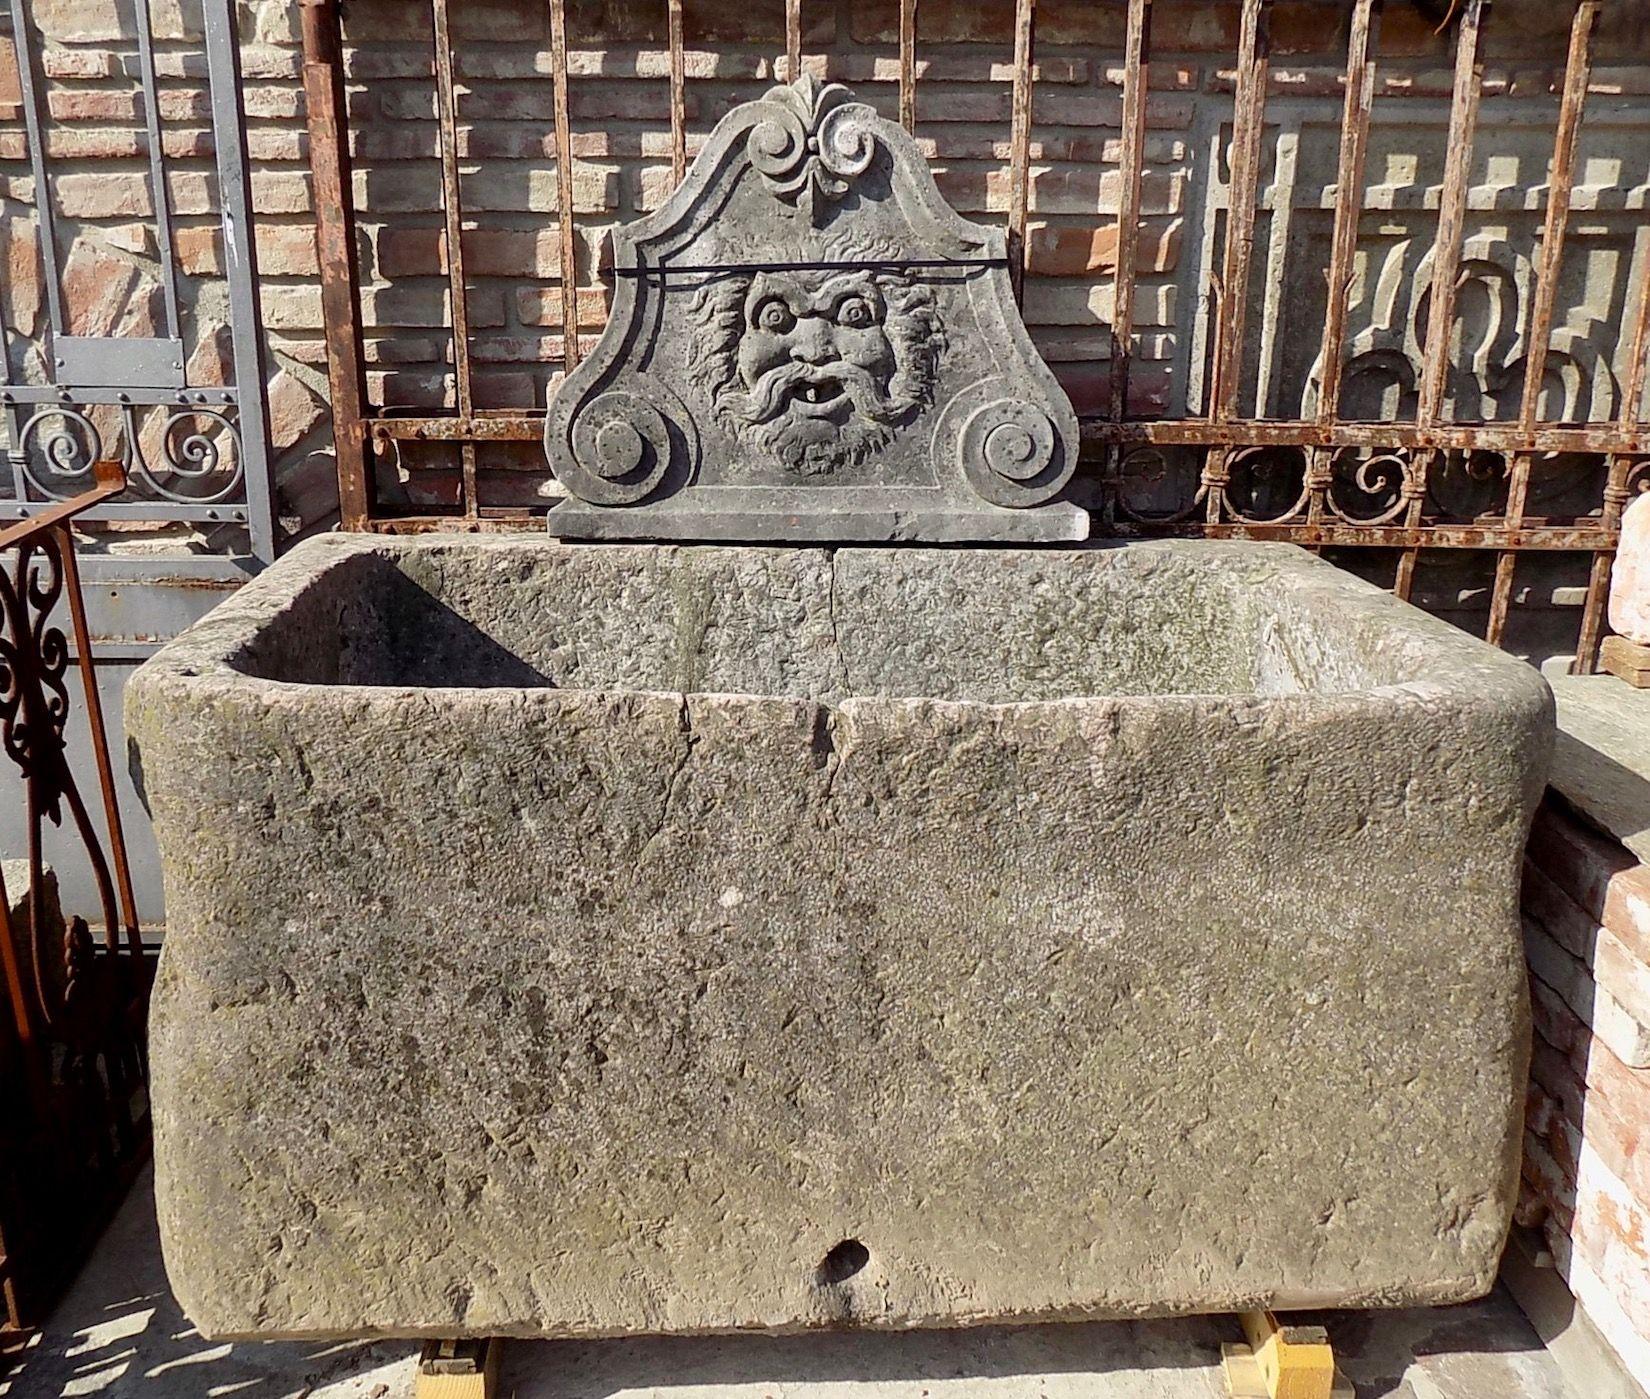 Vasche In Pietra Per Fontane antica vasca in pietra con mascherone originale di recupero